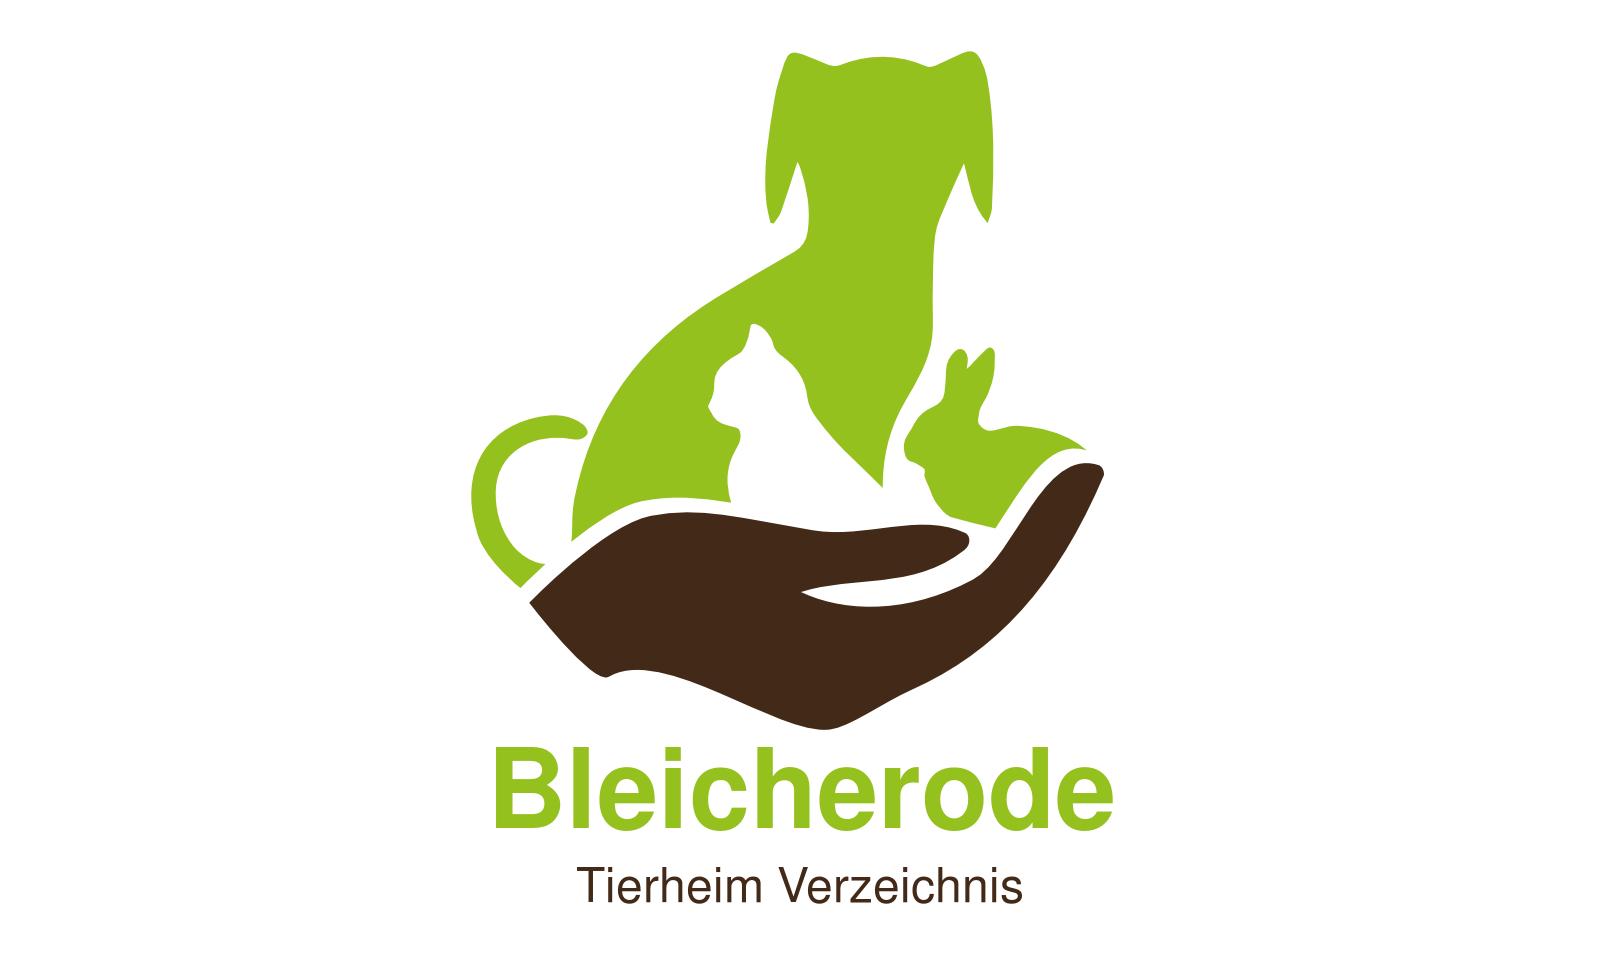 Tierheim Bleicherode